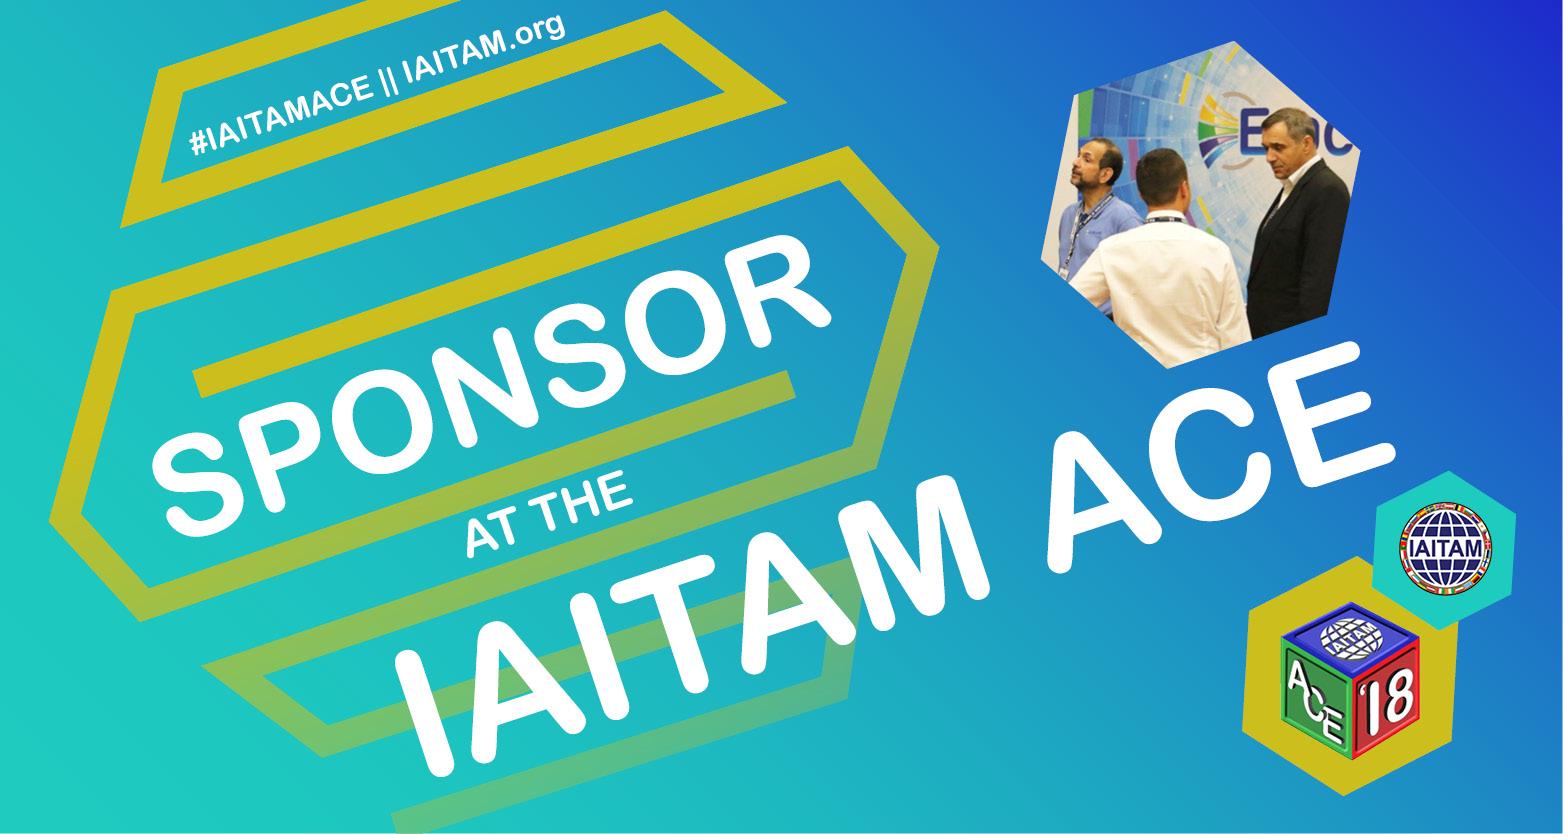 Sponsor at the European IAITAM ACE 2018